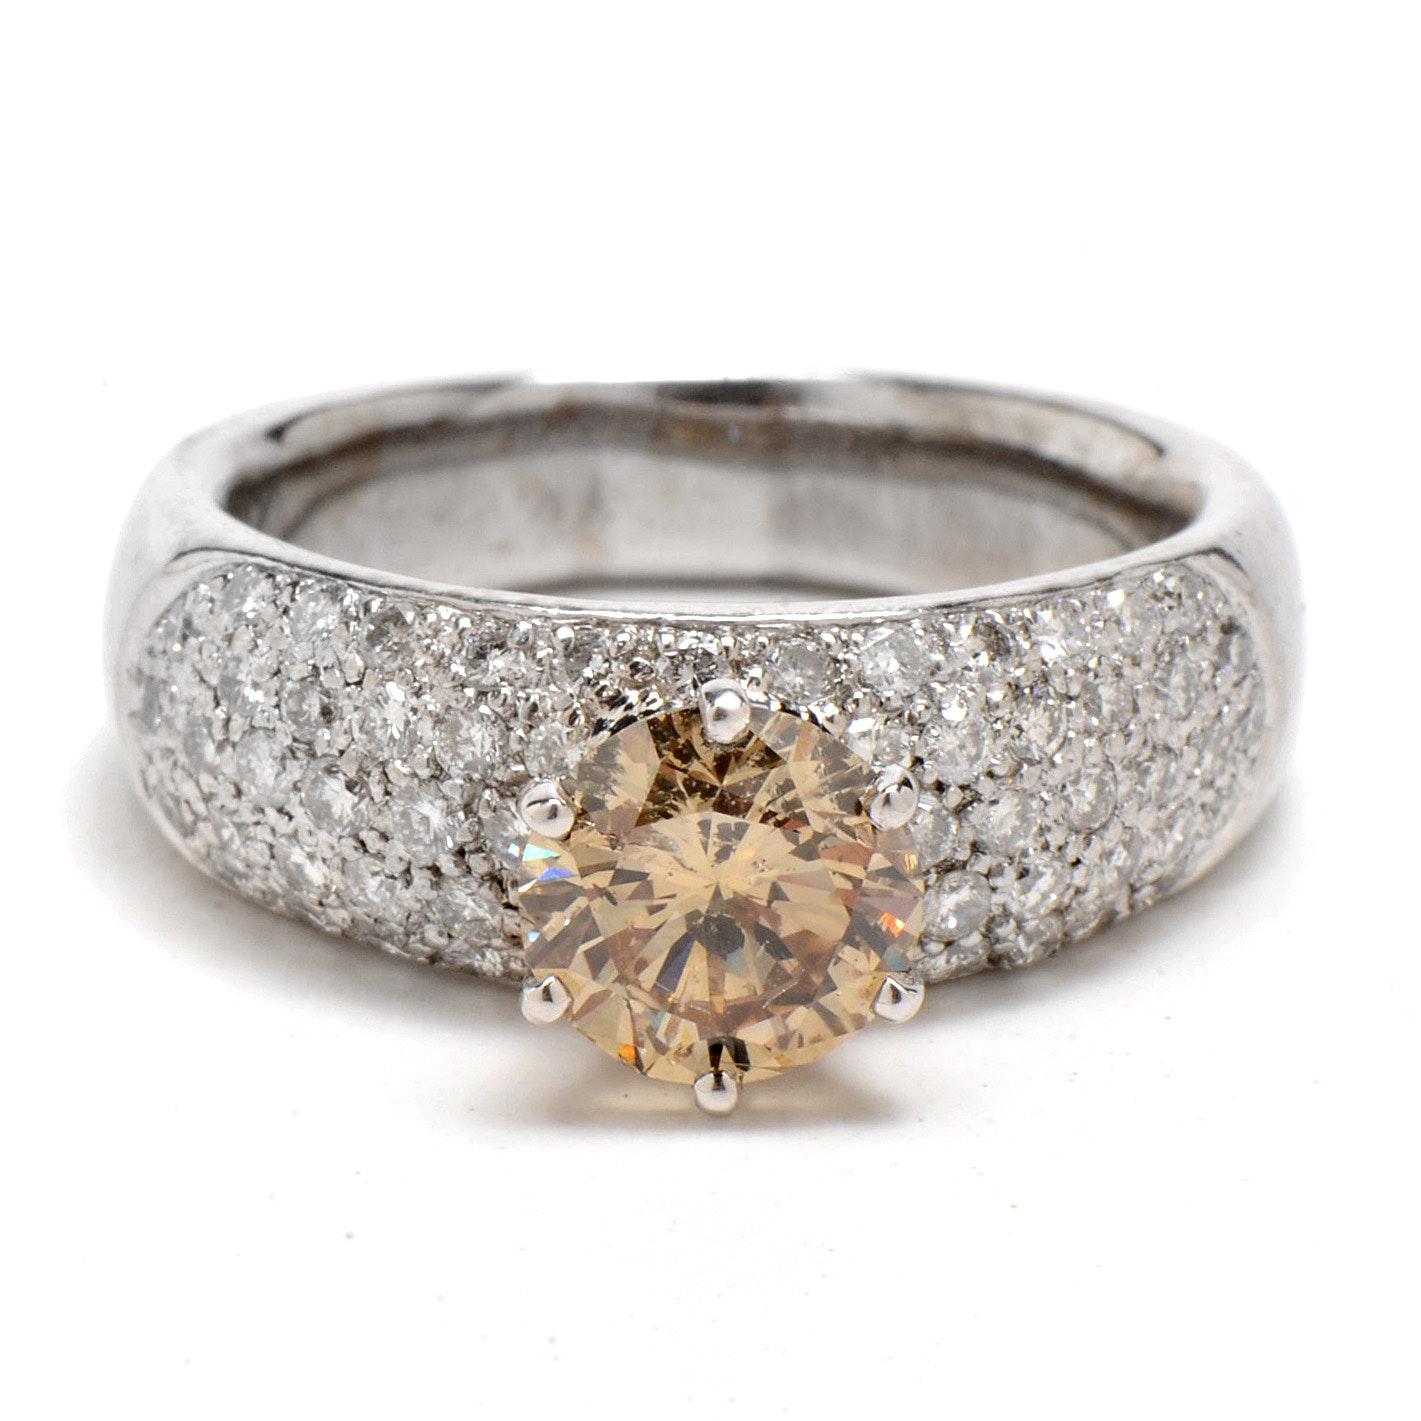 18K White Gold 1.71 CTS Light Brown Diamond Statement Ring